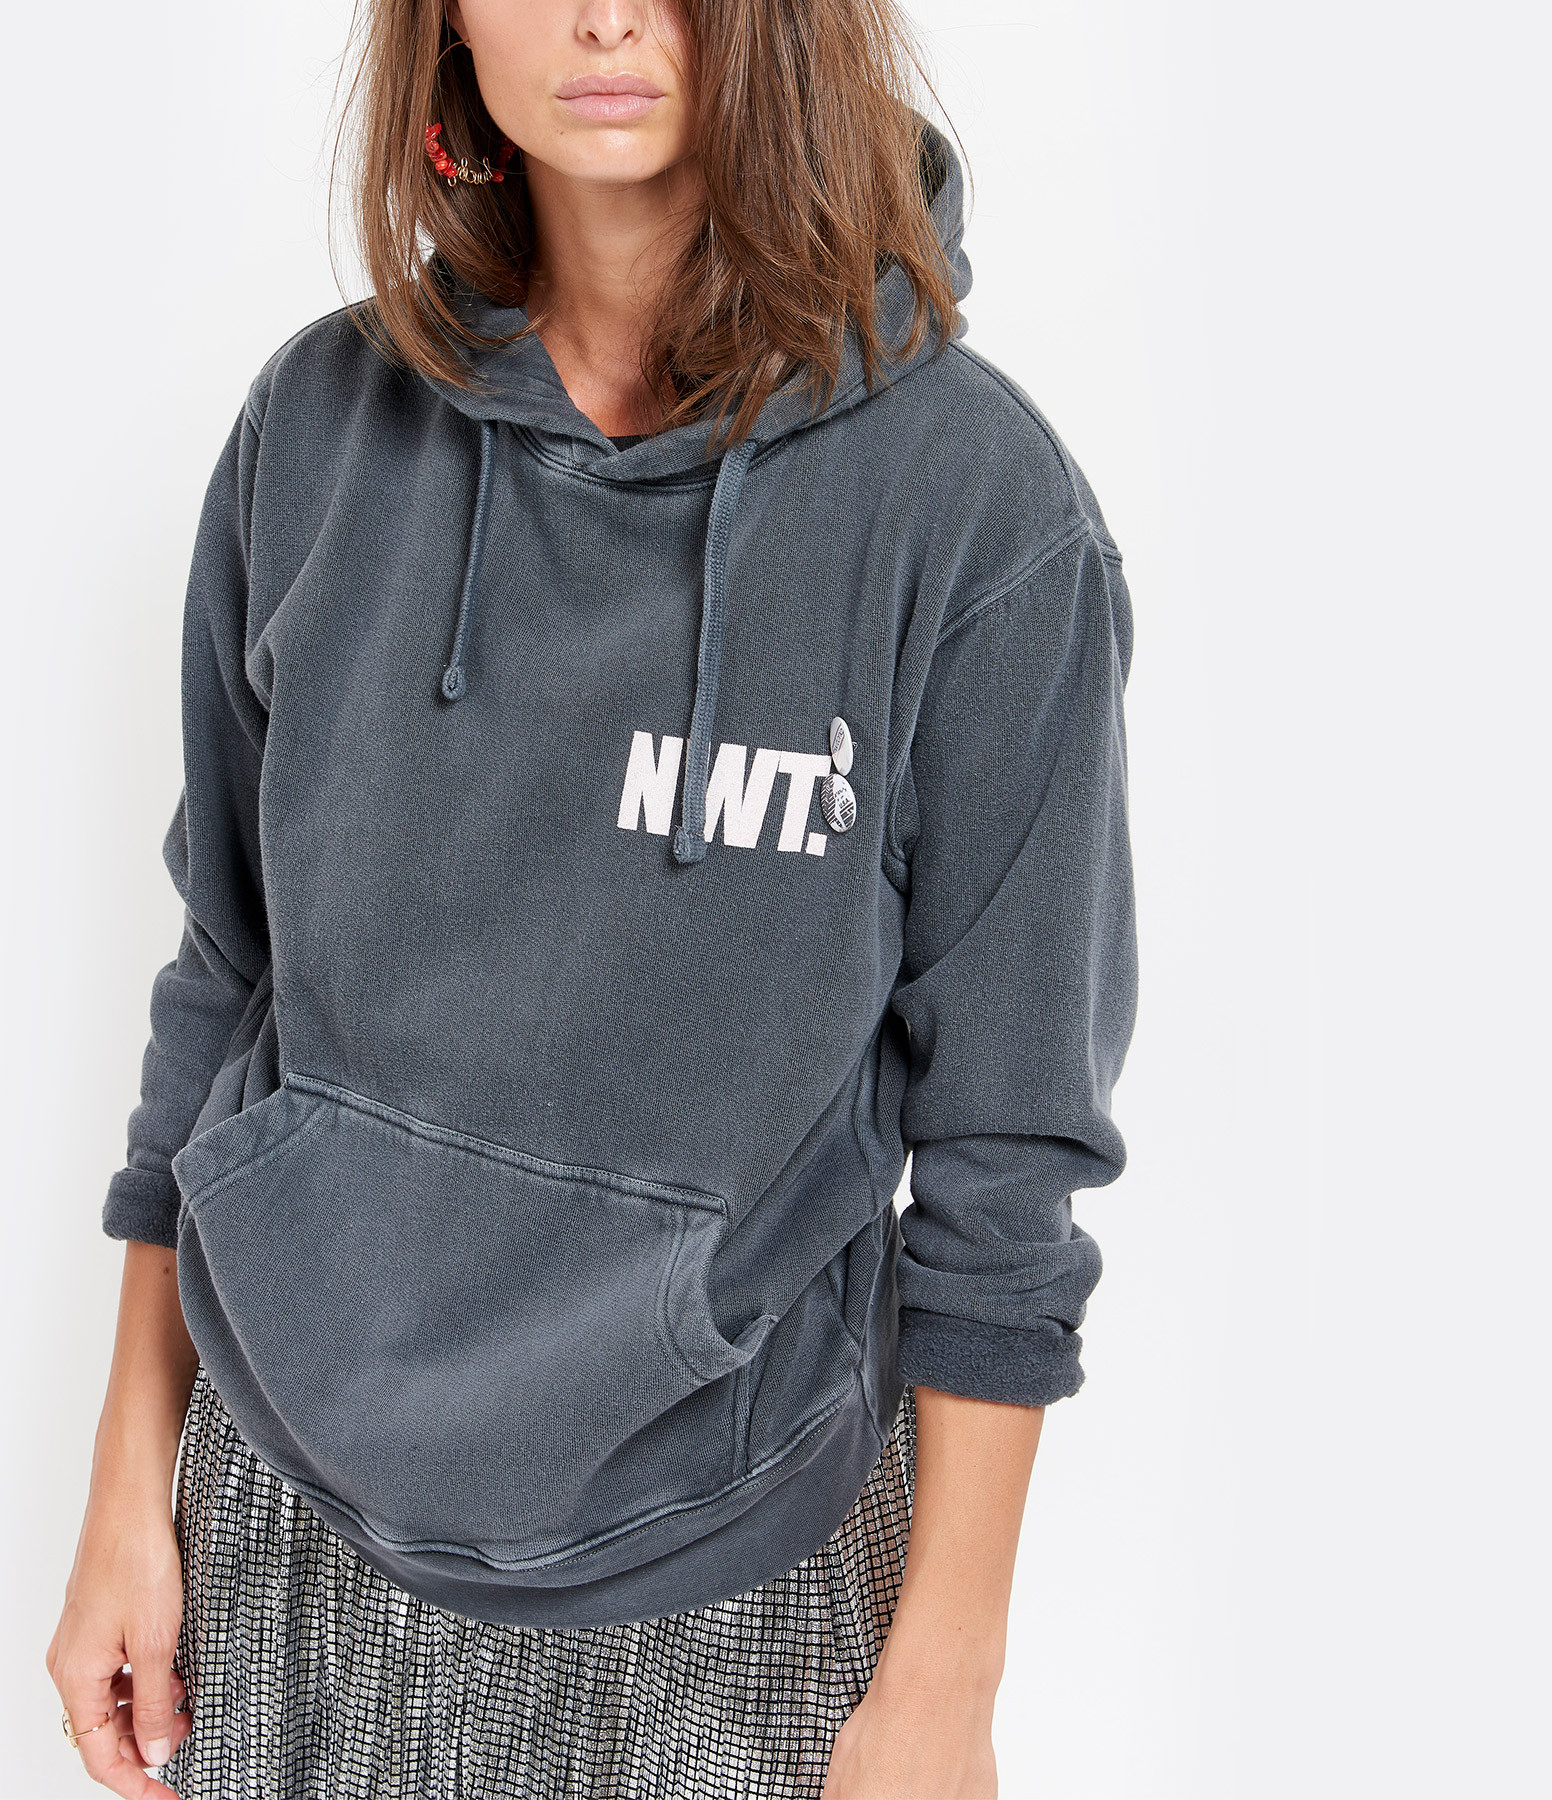 NEWTONE - Sweatshirt Hoody Pistols Coton Pepper